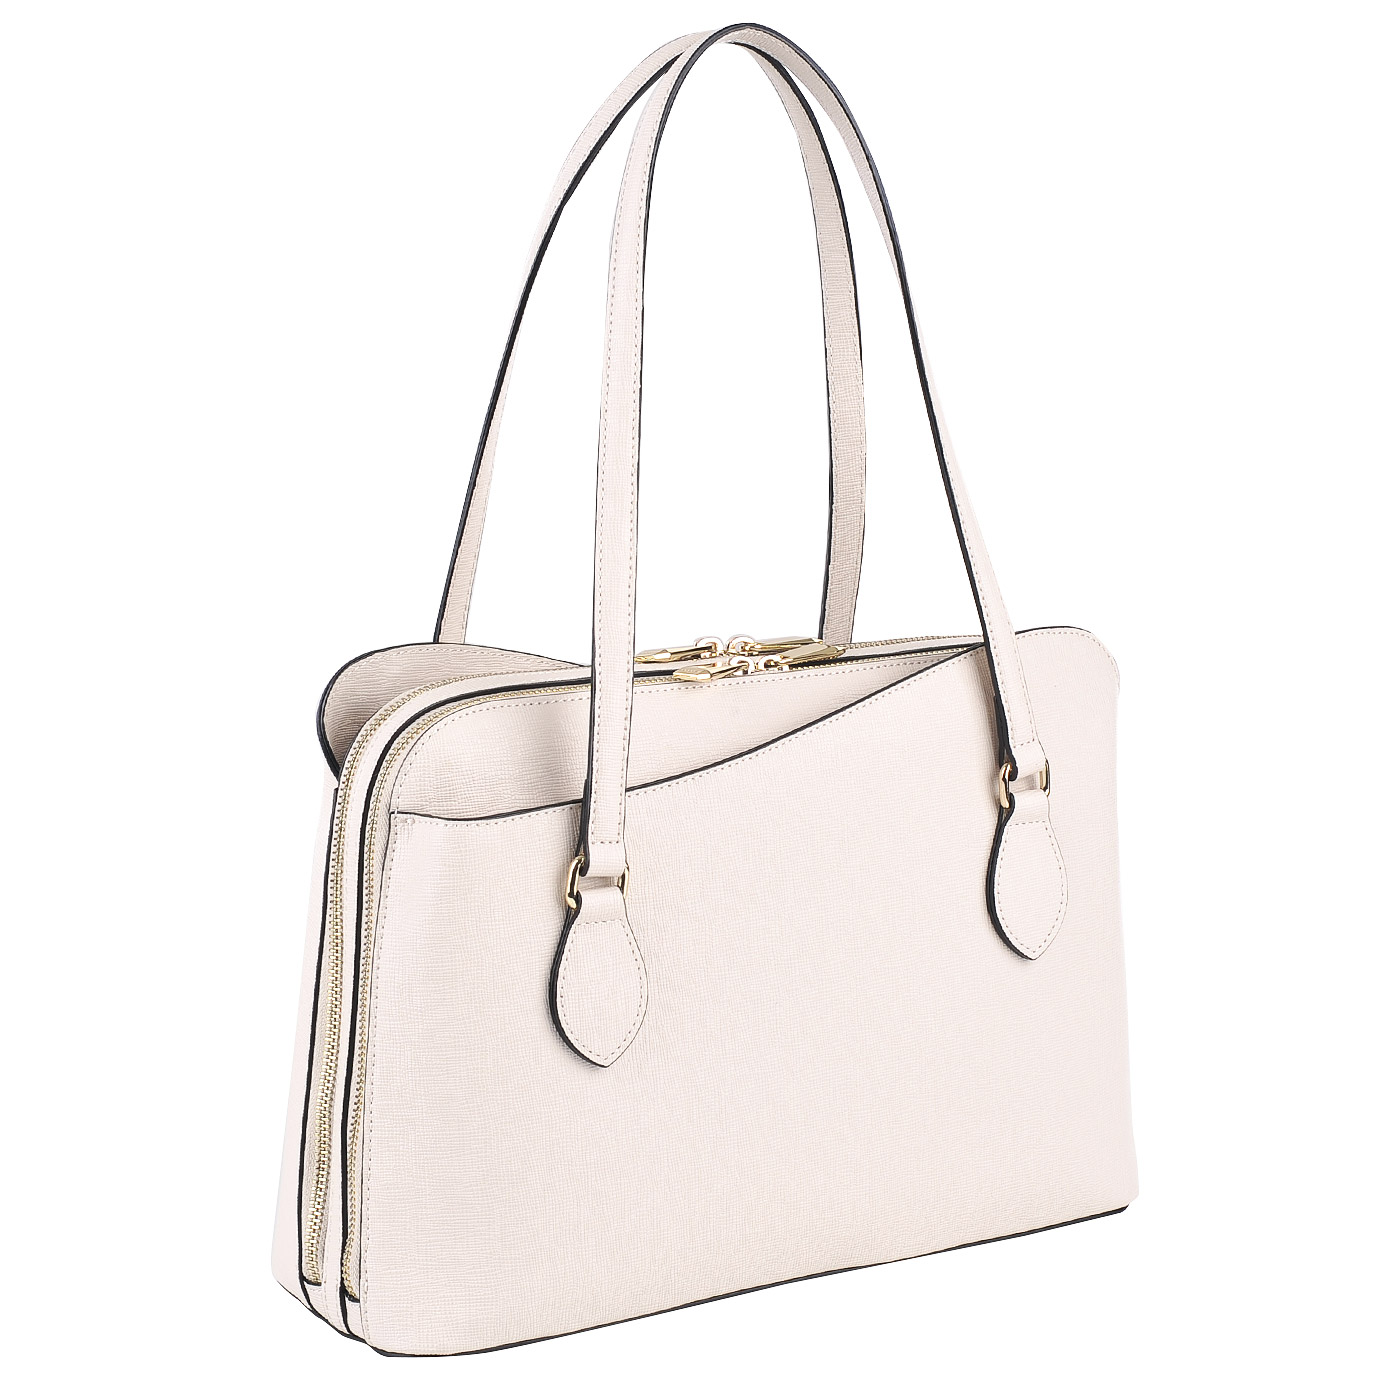 948948bbd0ad Женская кожаная сумка Cromia Mina 1403194_avorio - 2000557668447 ...